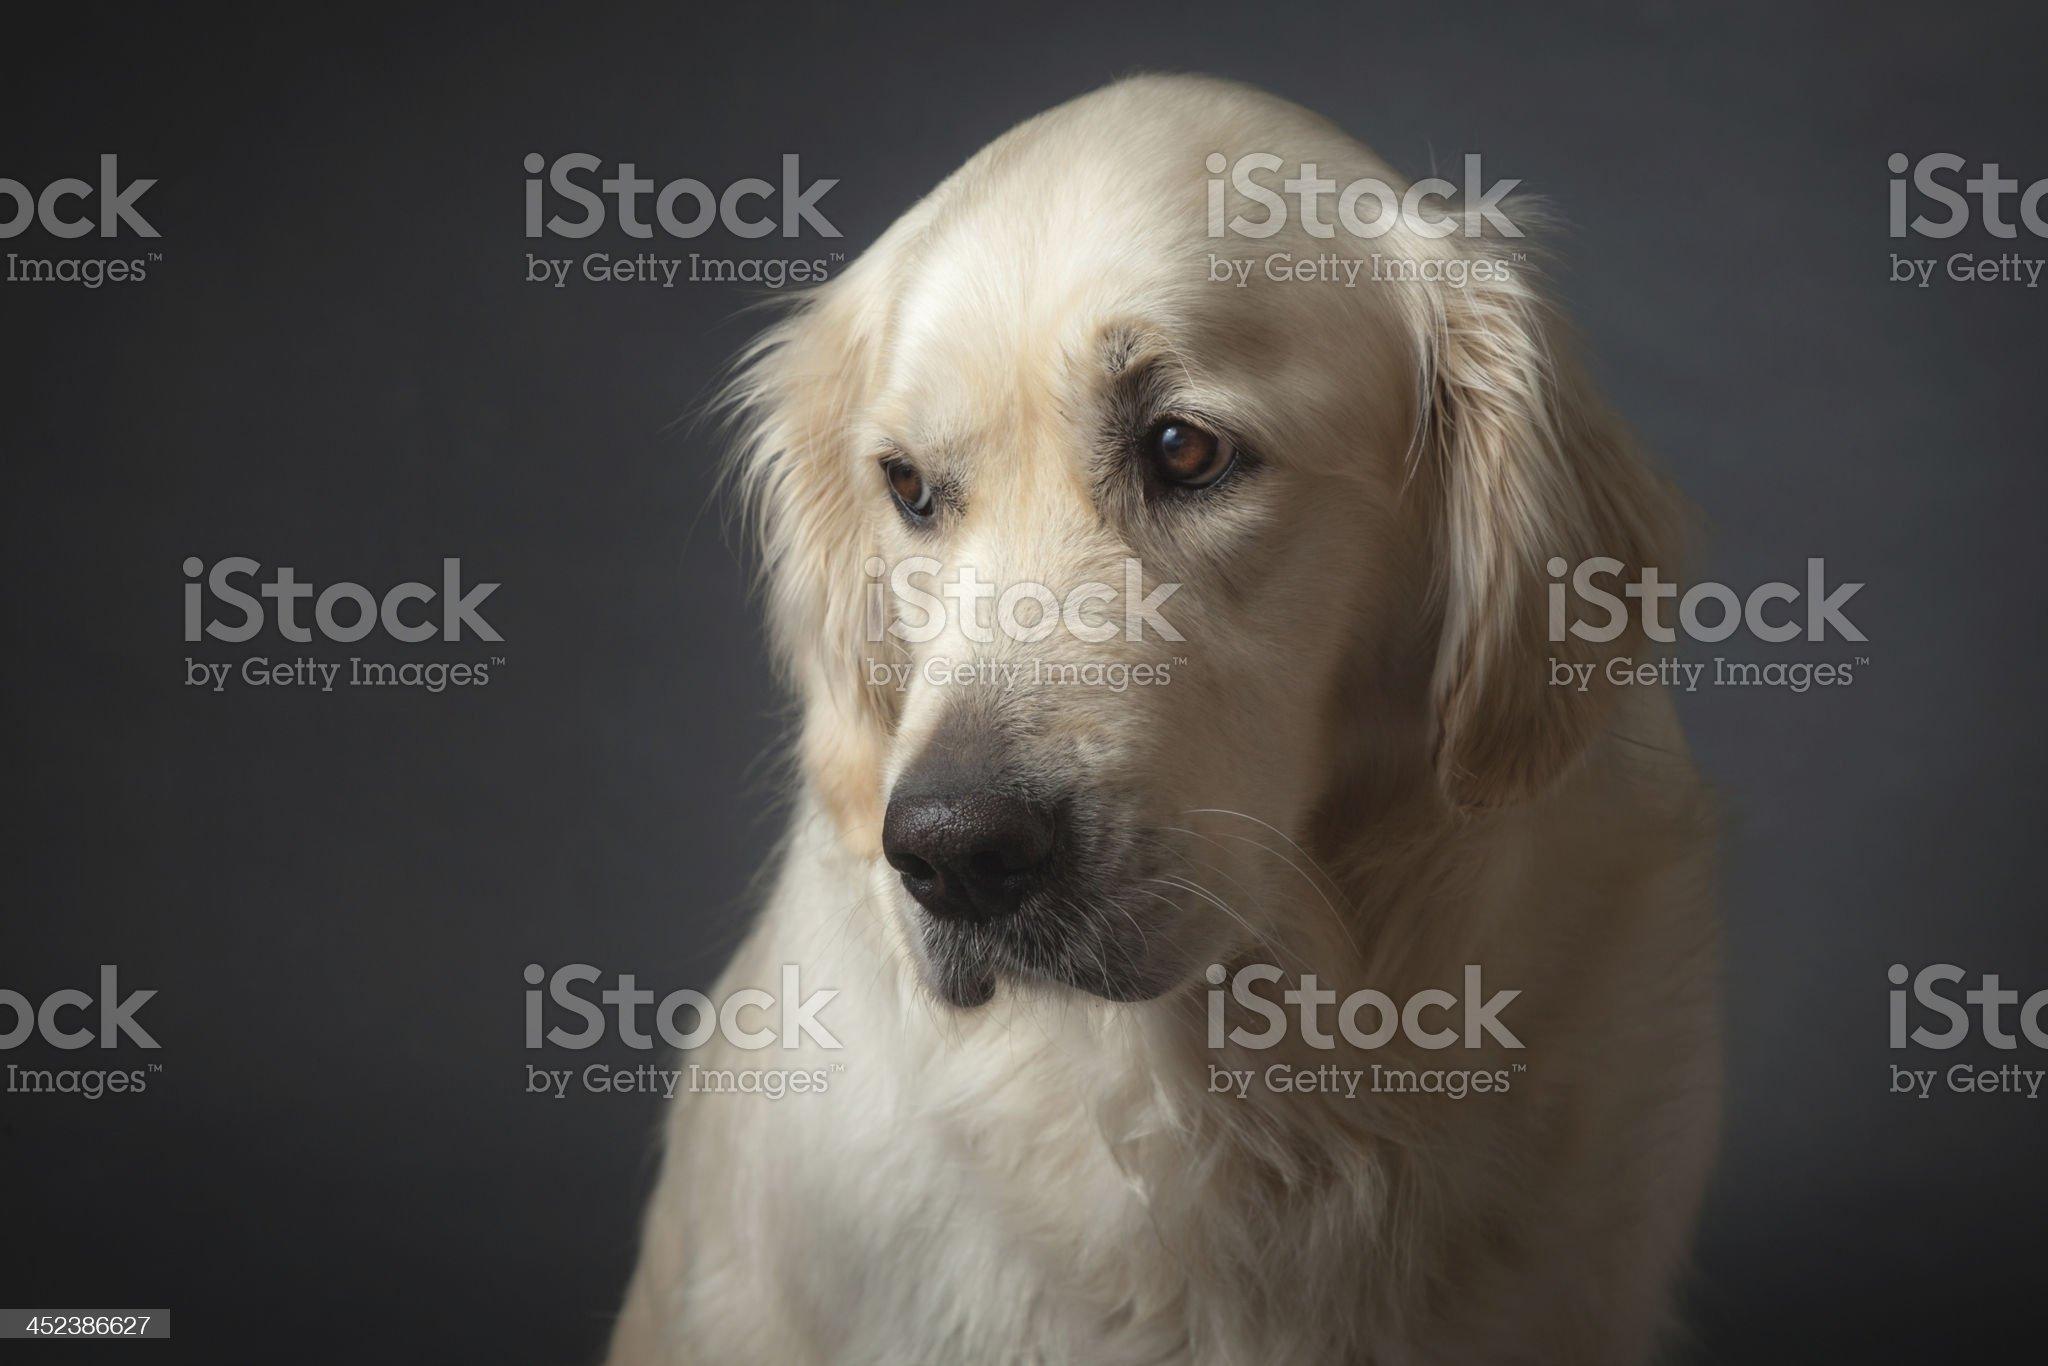 Portrait of Sad Dog royalty-free stock photo